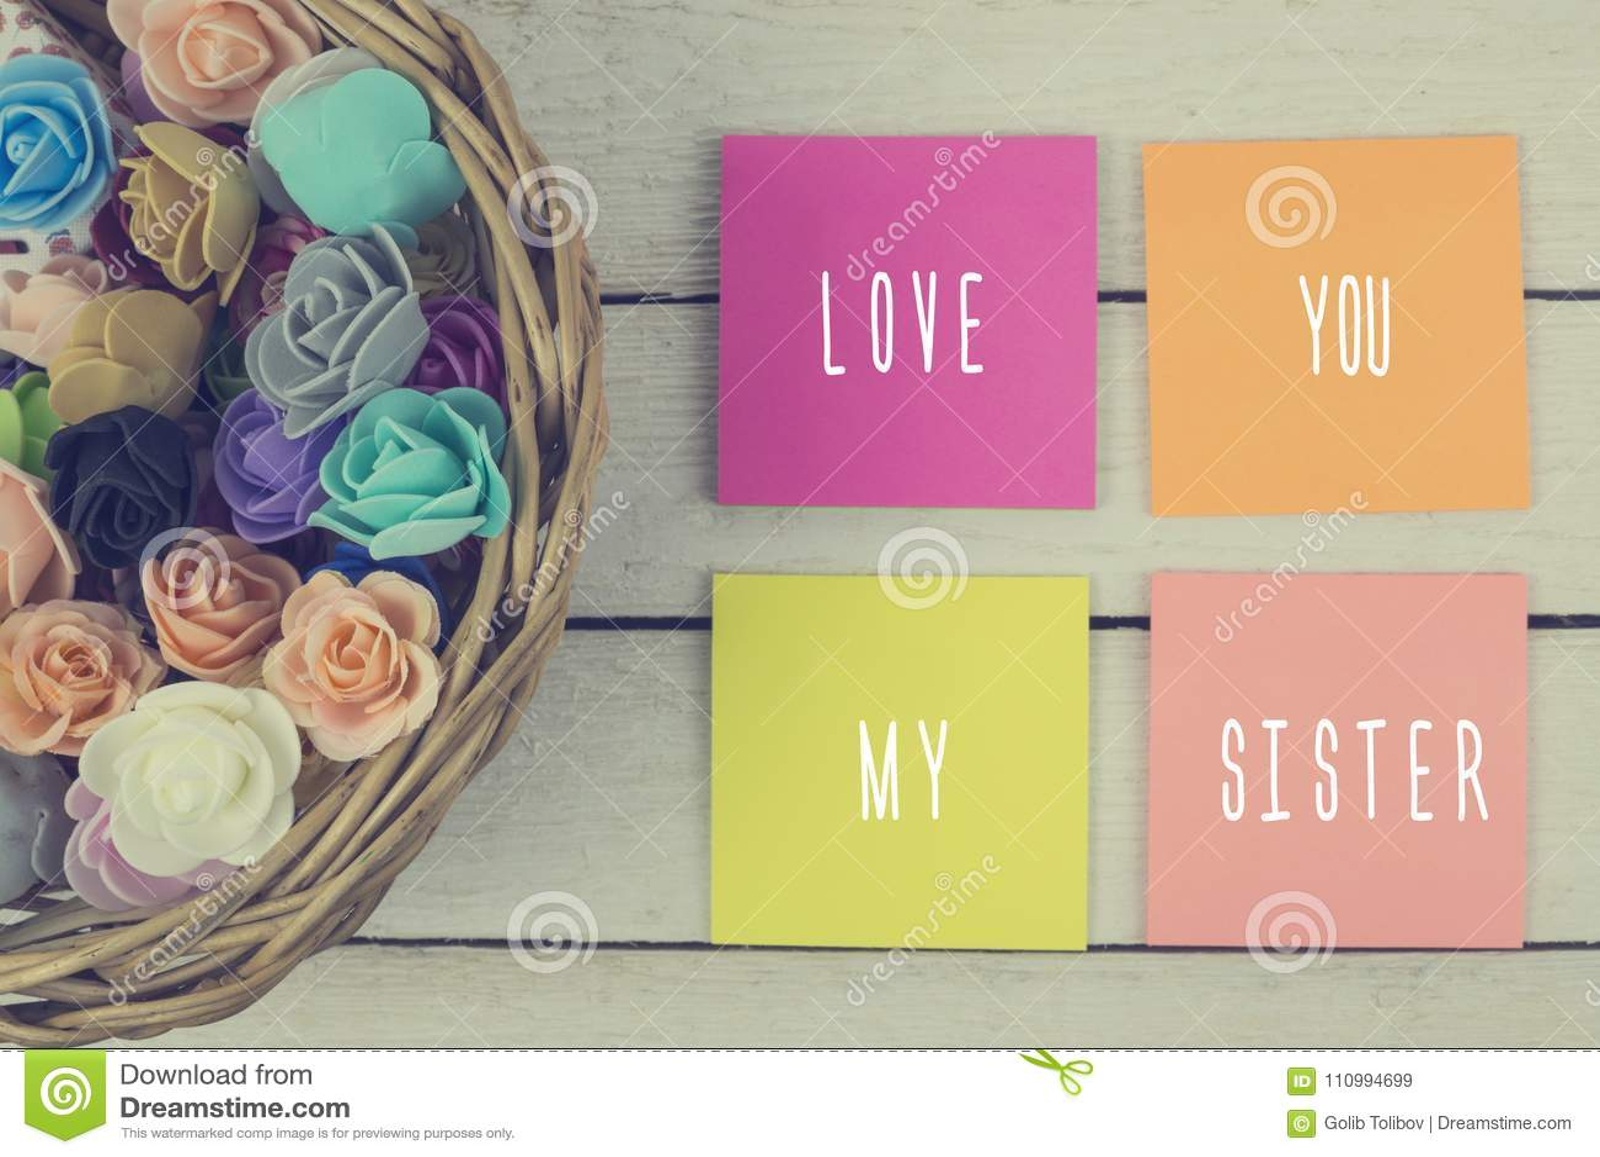 I love you sister. Toned.